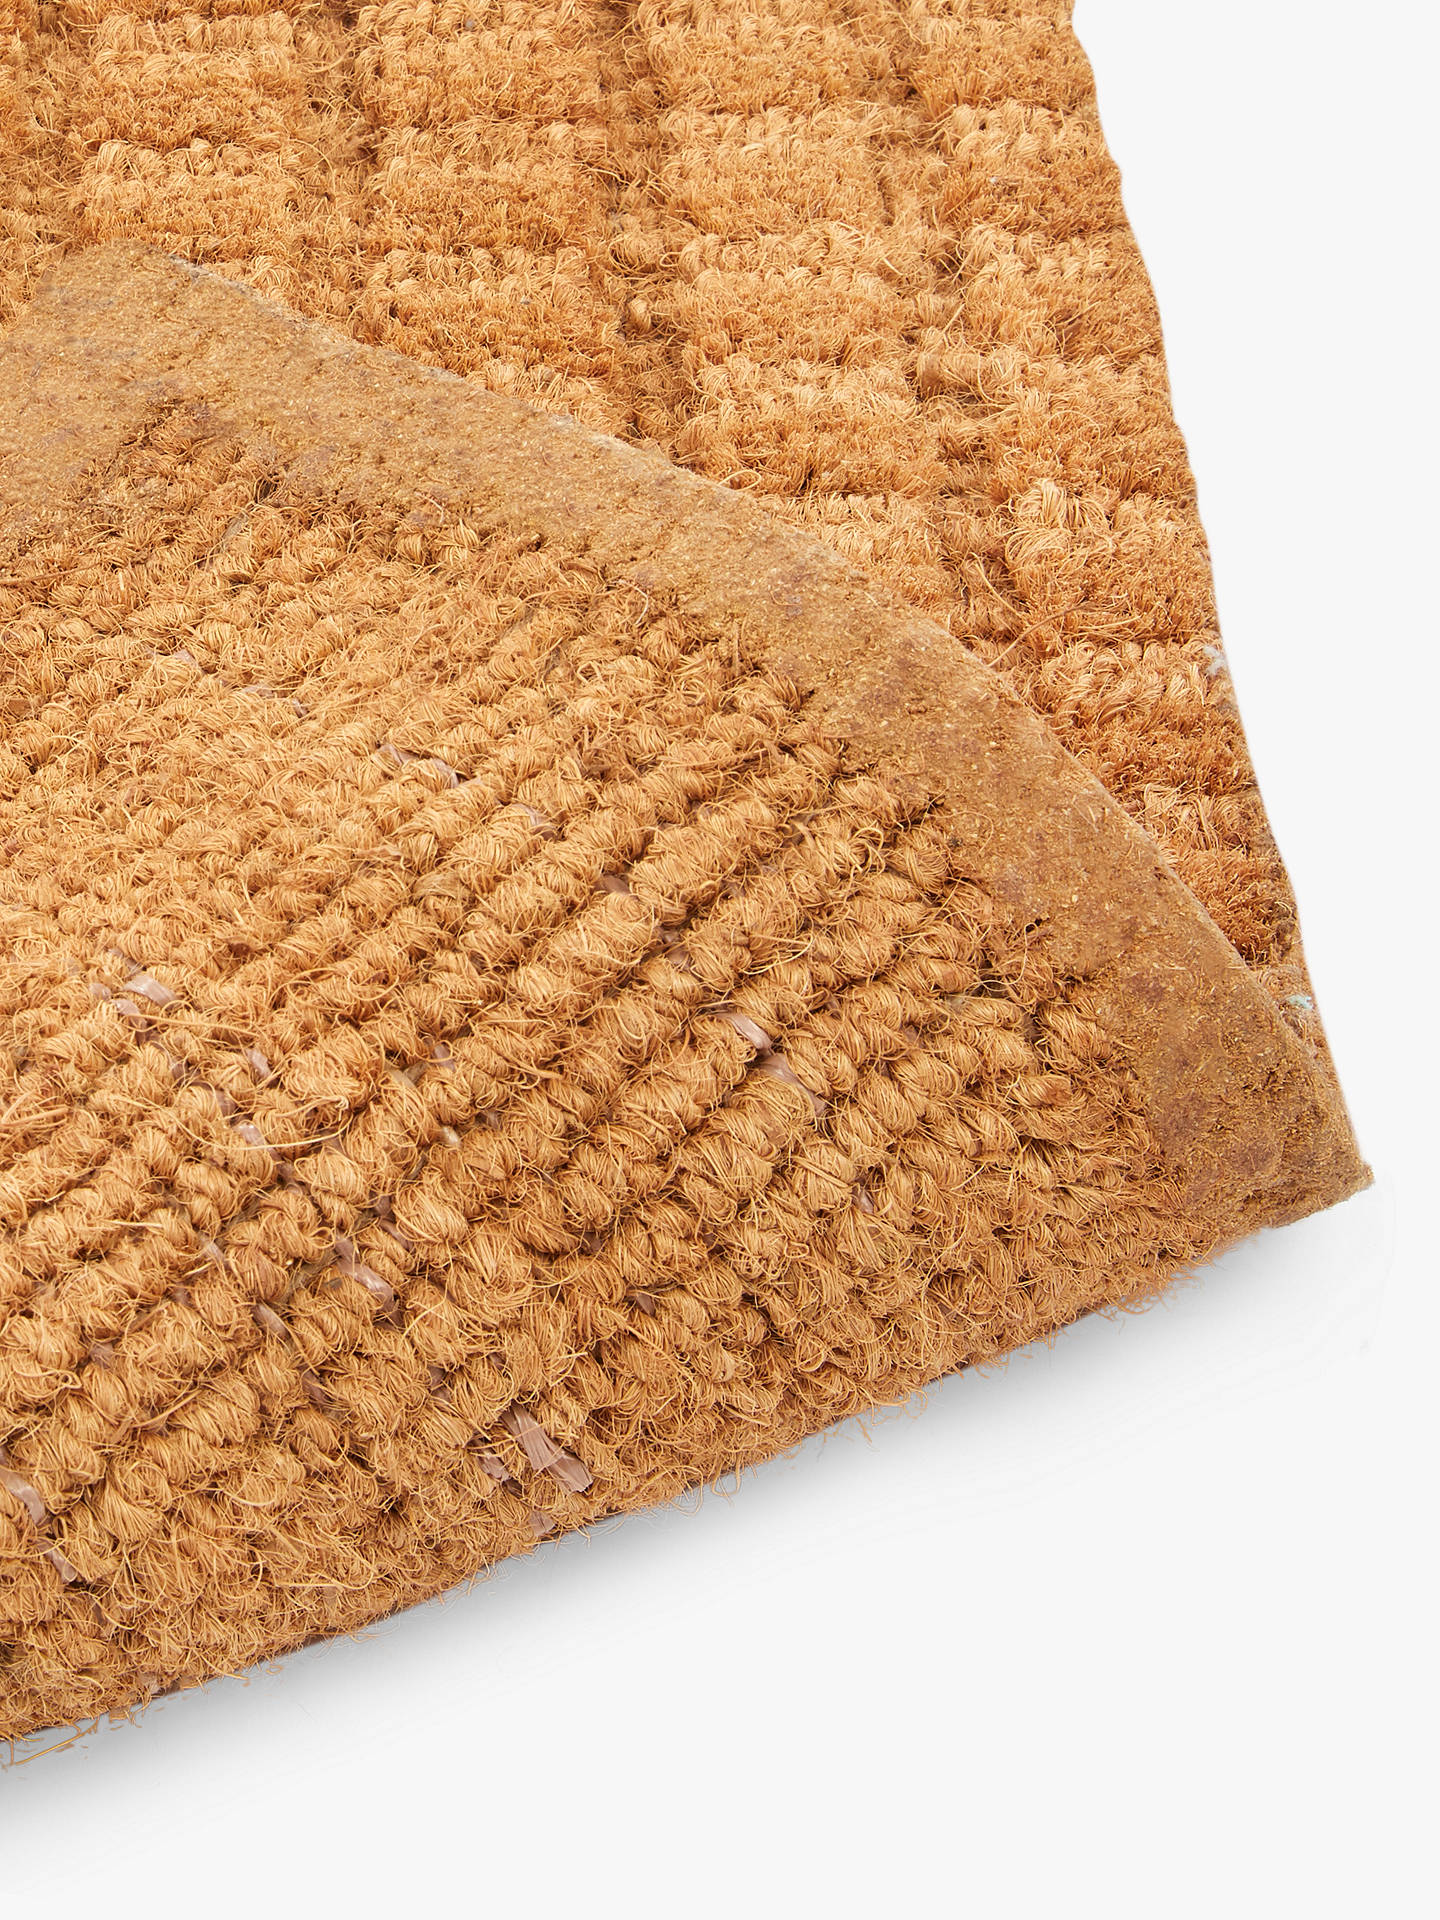 John Lewis Amp Partners Thick Knotted Coir Door Mat Natural